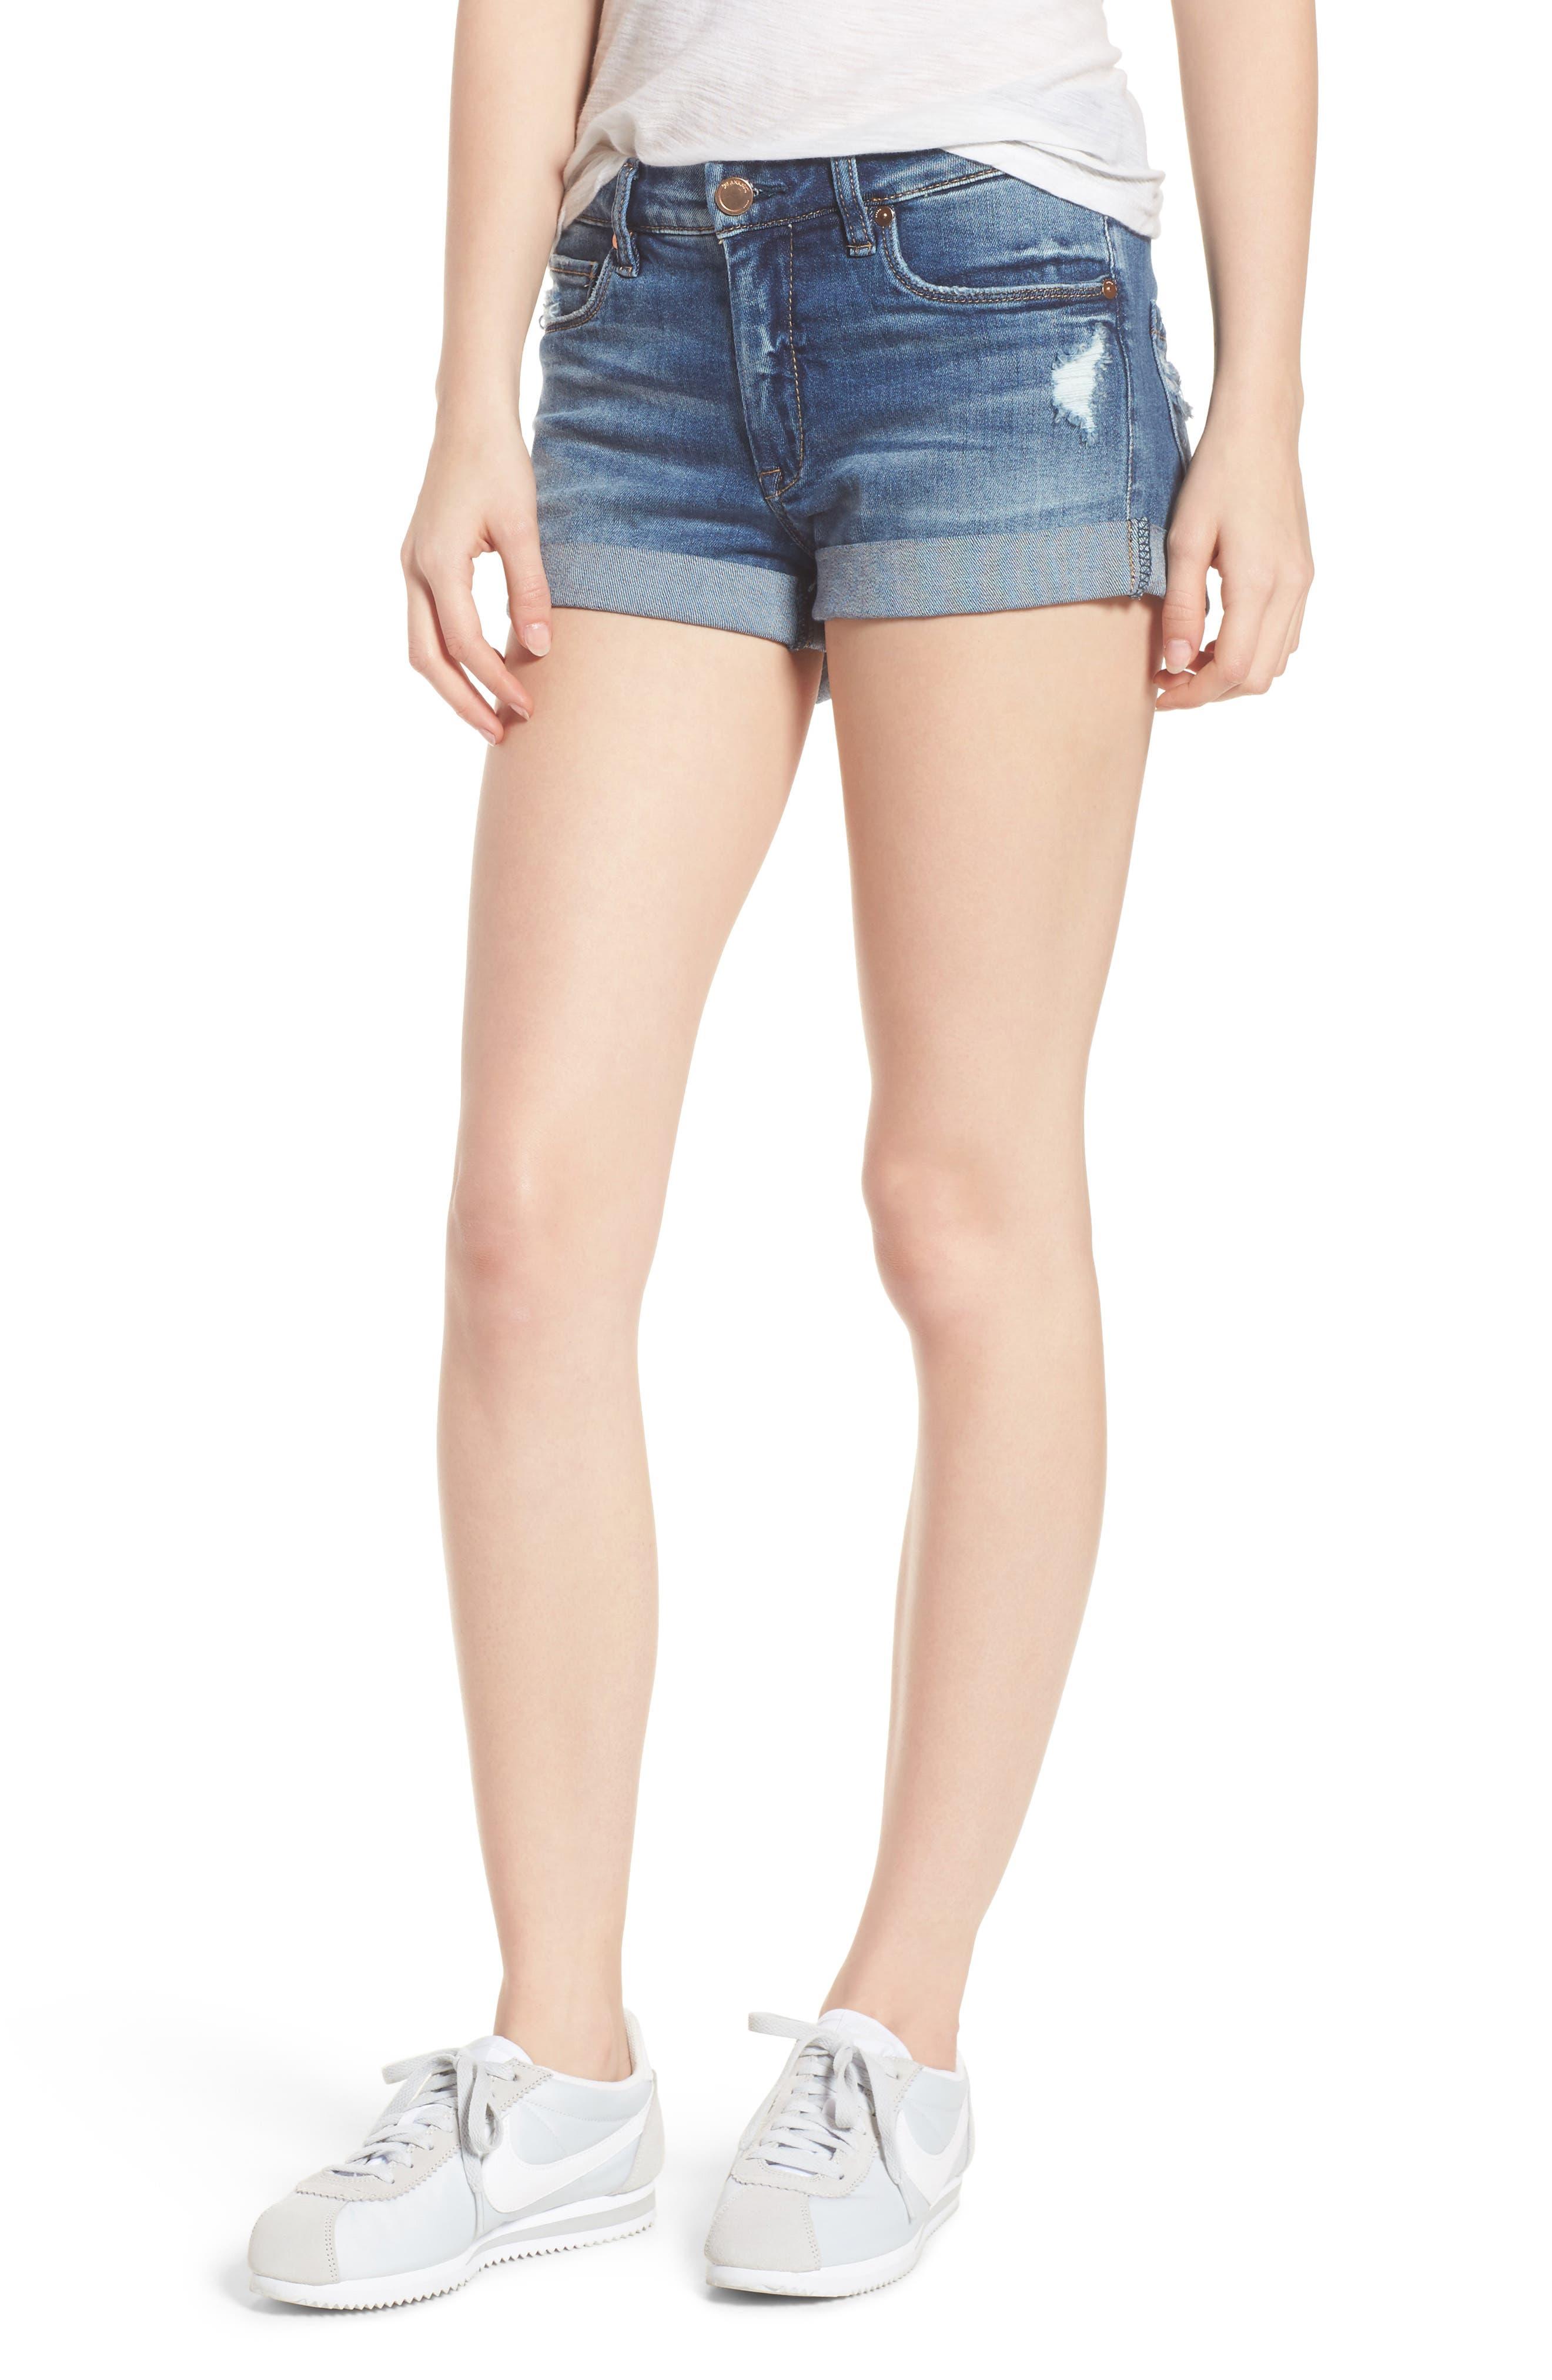 Plalay Hard Cuffed Jean Shorts,                         Main,                         color, Blue